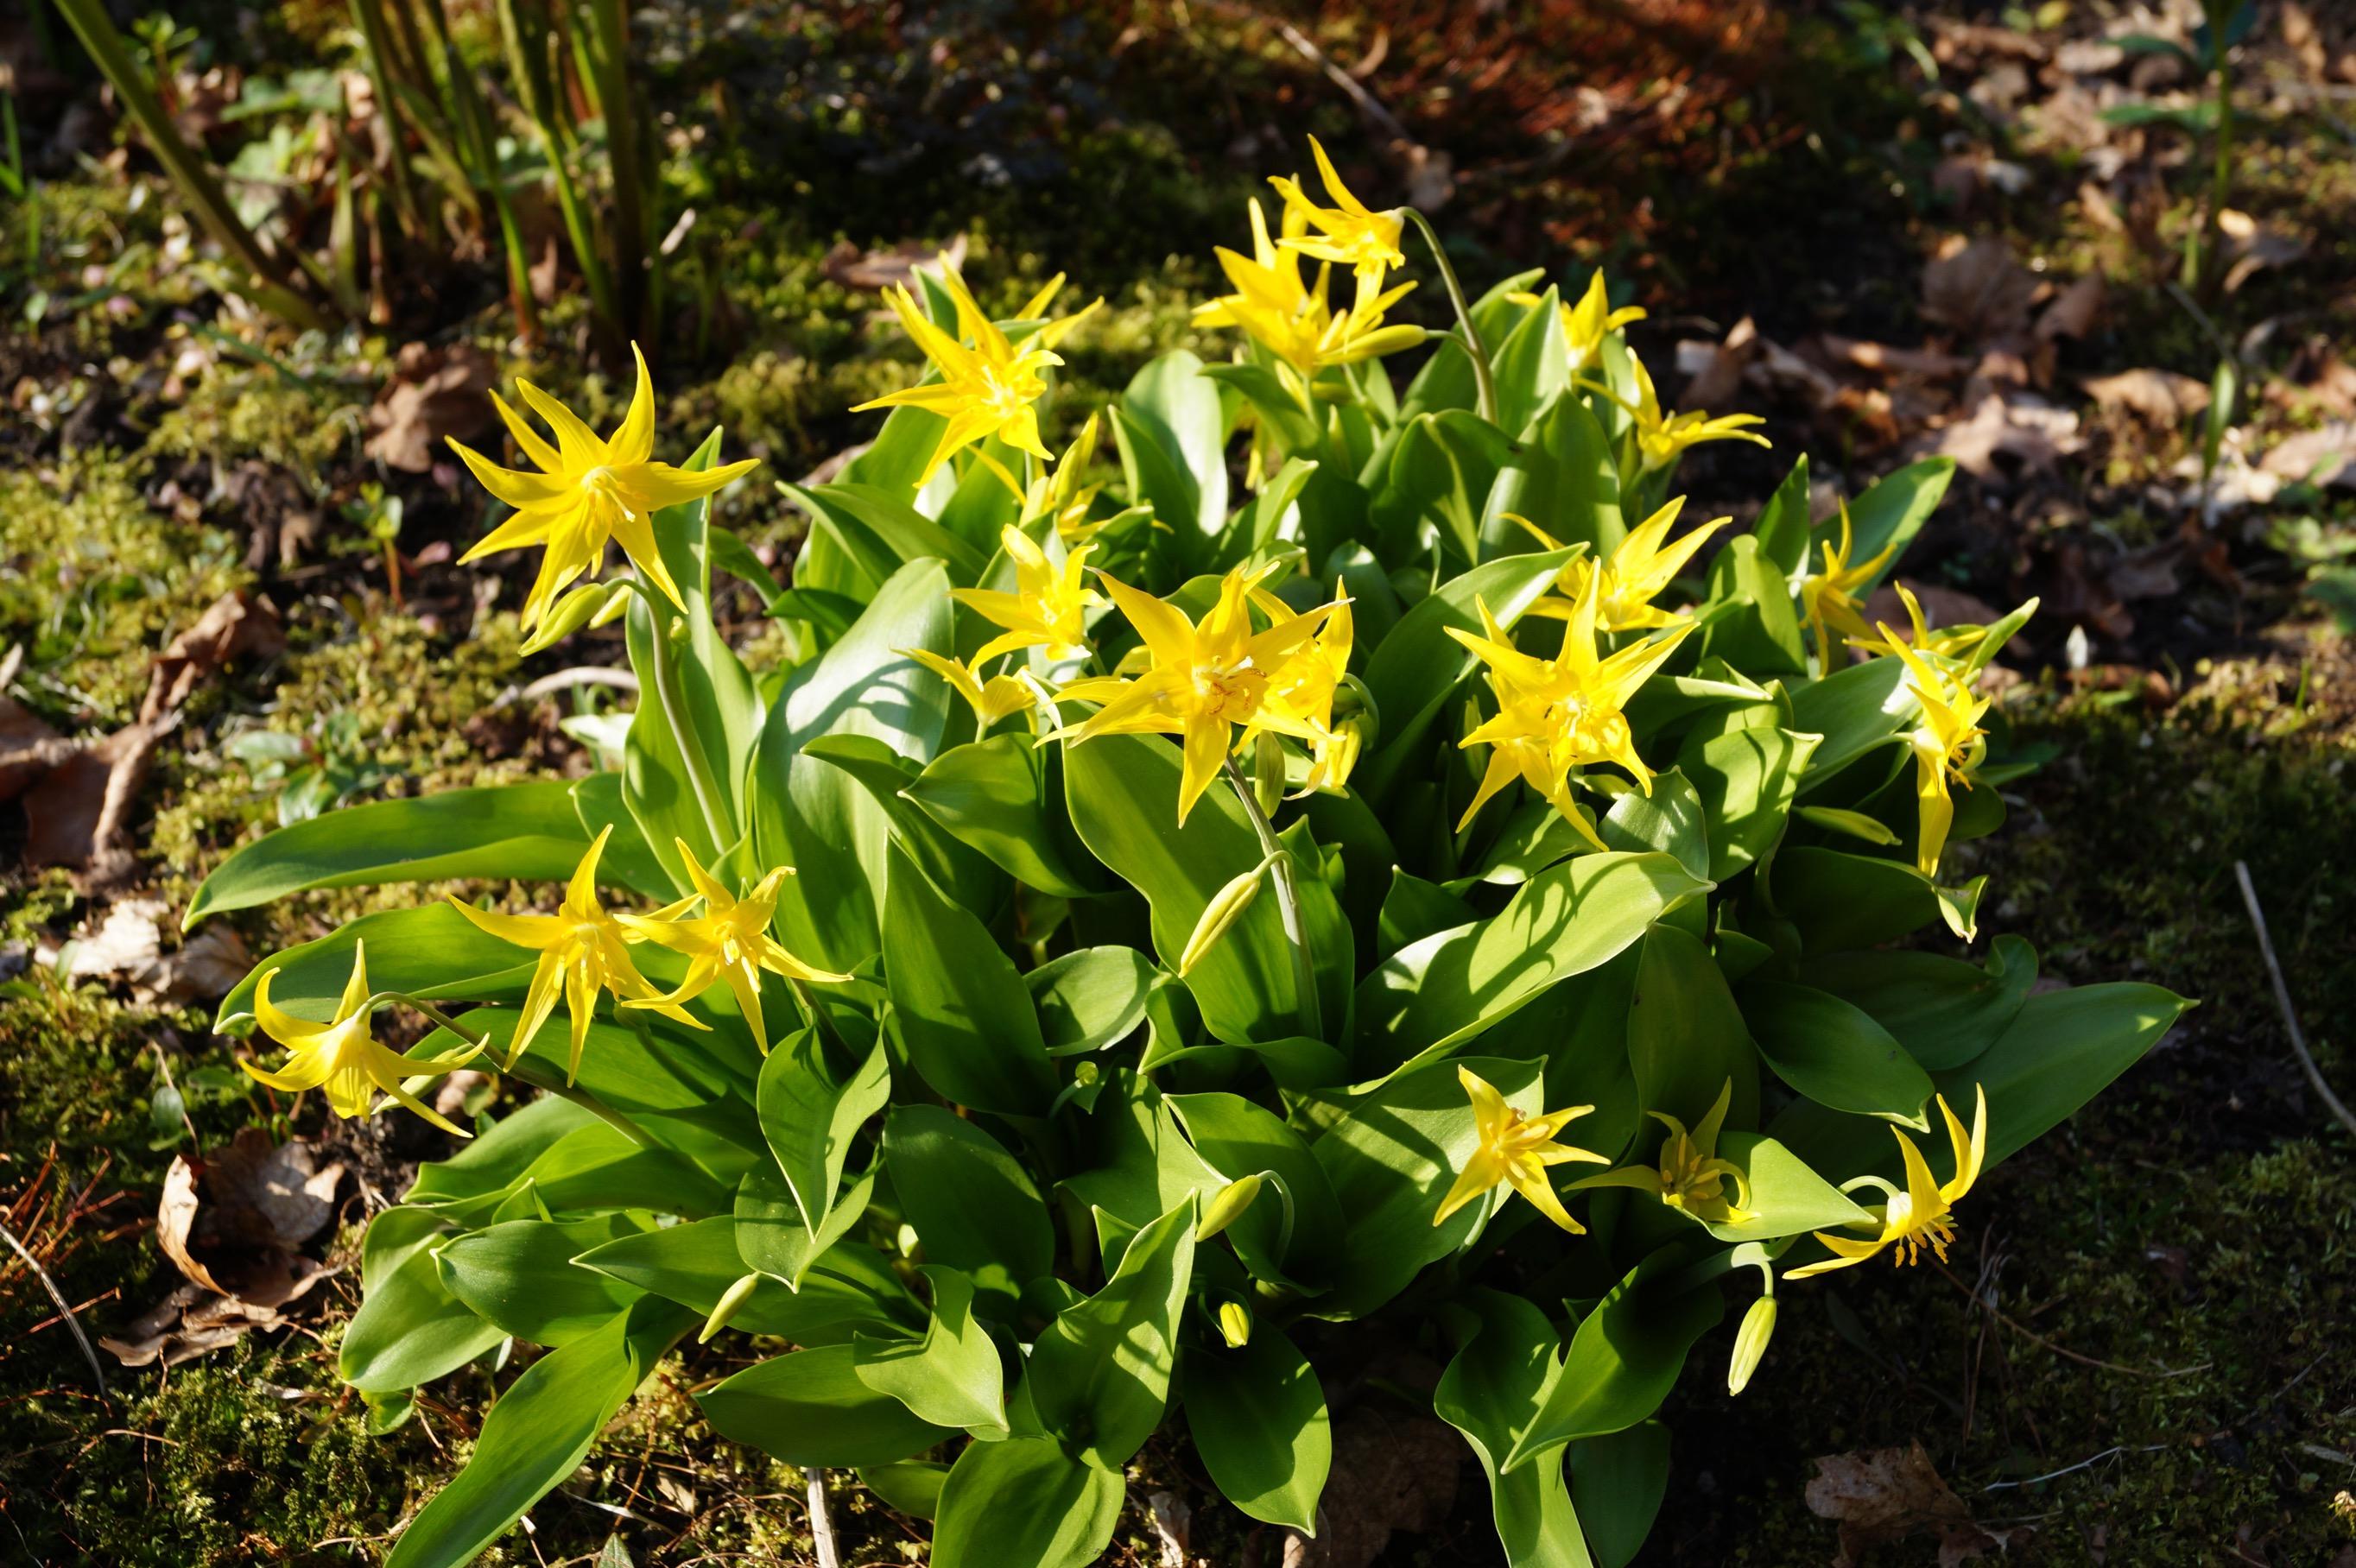 erythronium_eba_clone_2_morlas_plants